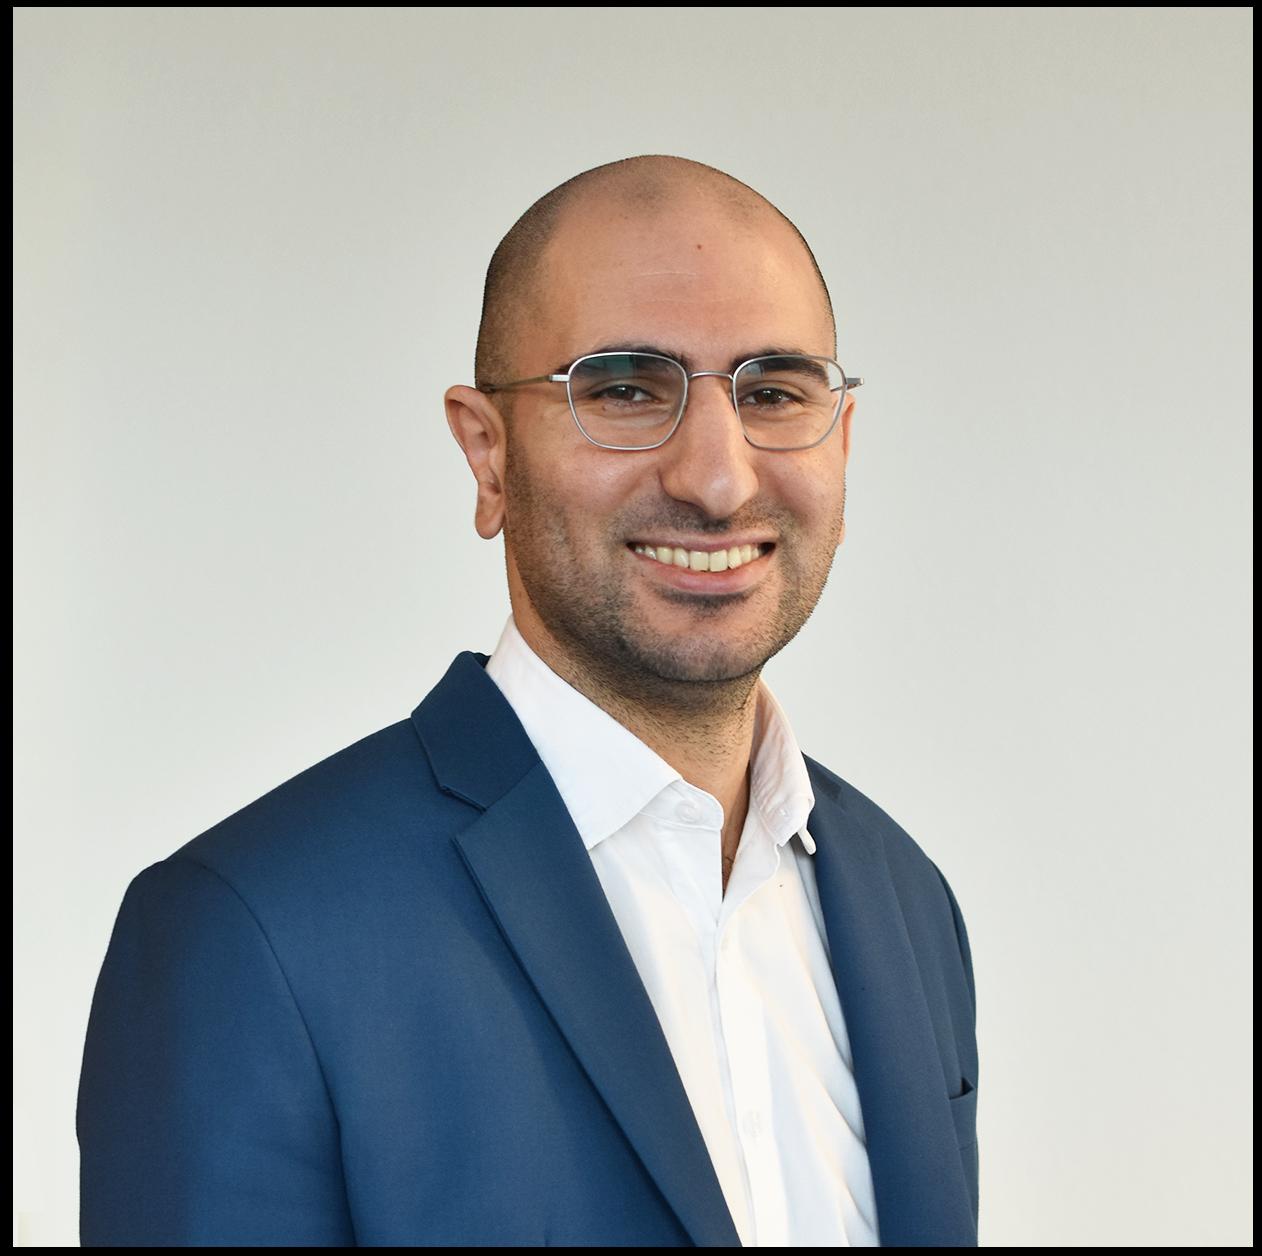 Rizgar saltik talks about how to use linkedin